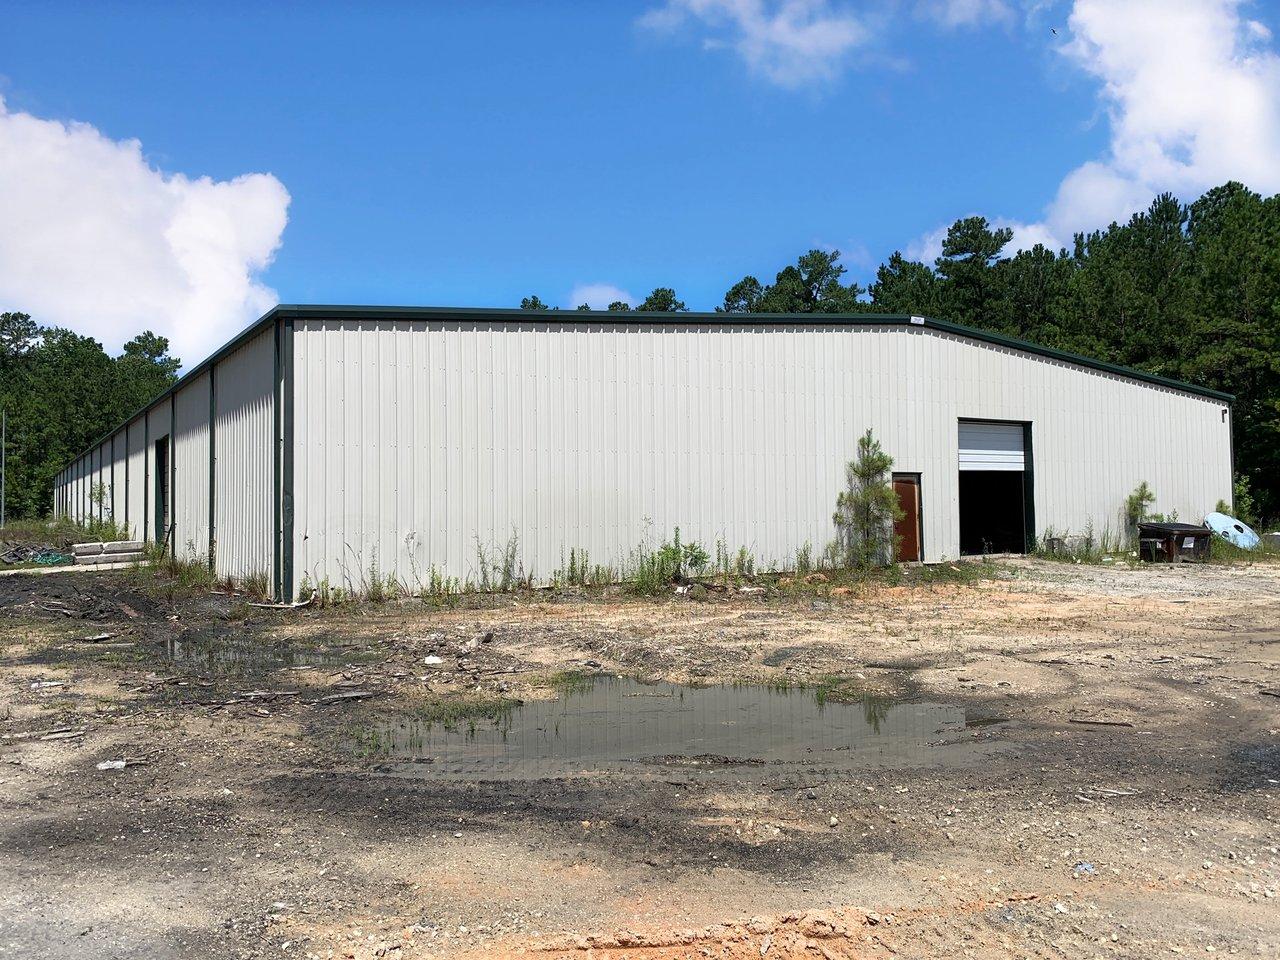 109 Old Depot Rd, Moncks Corner, SC, 29461